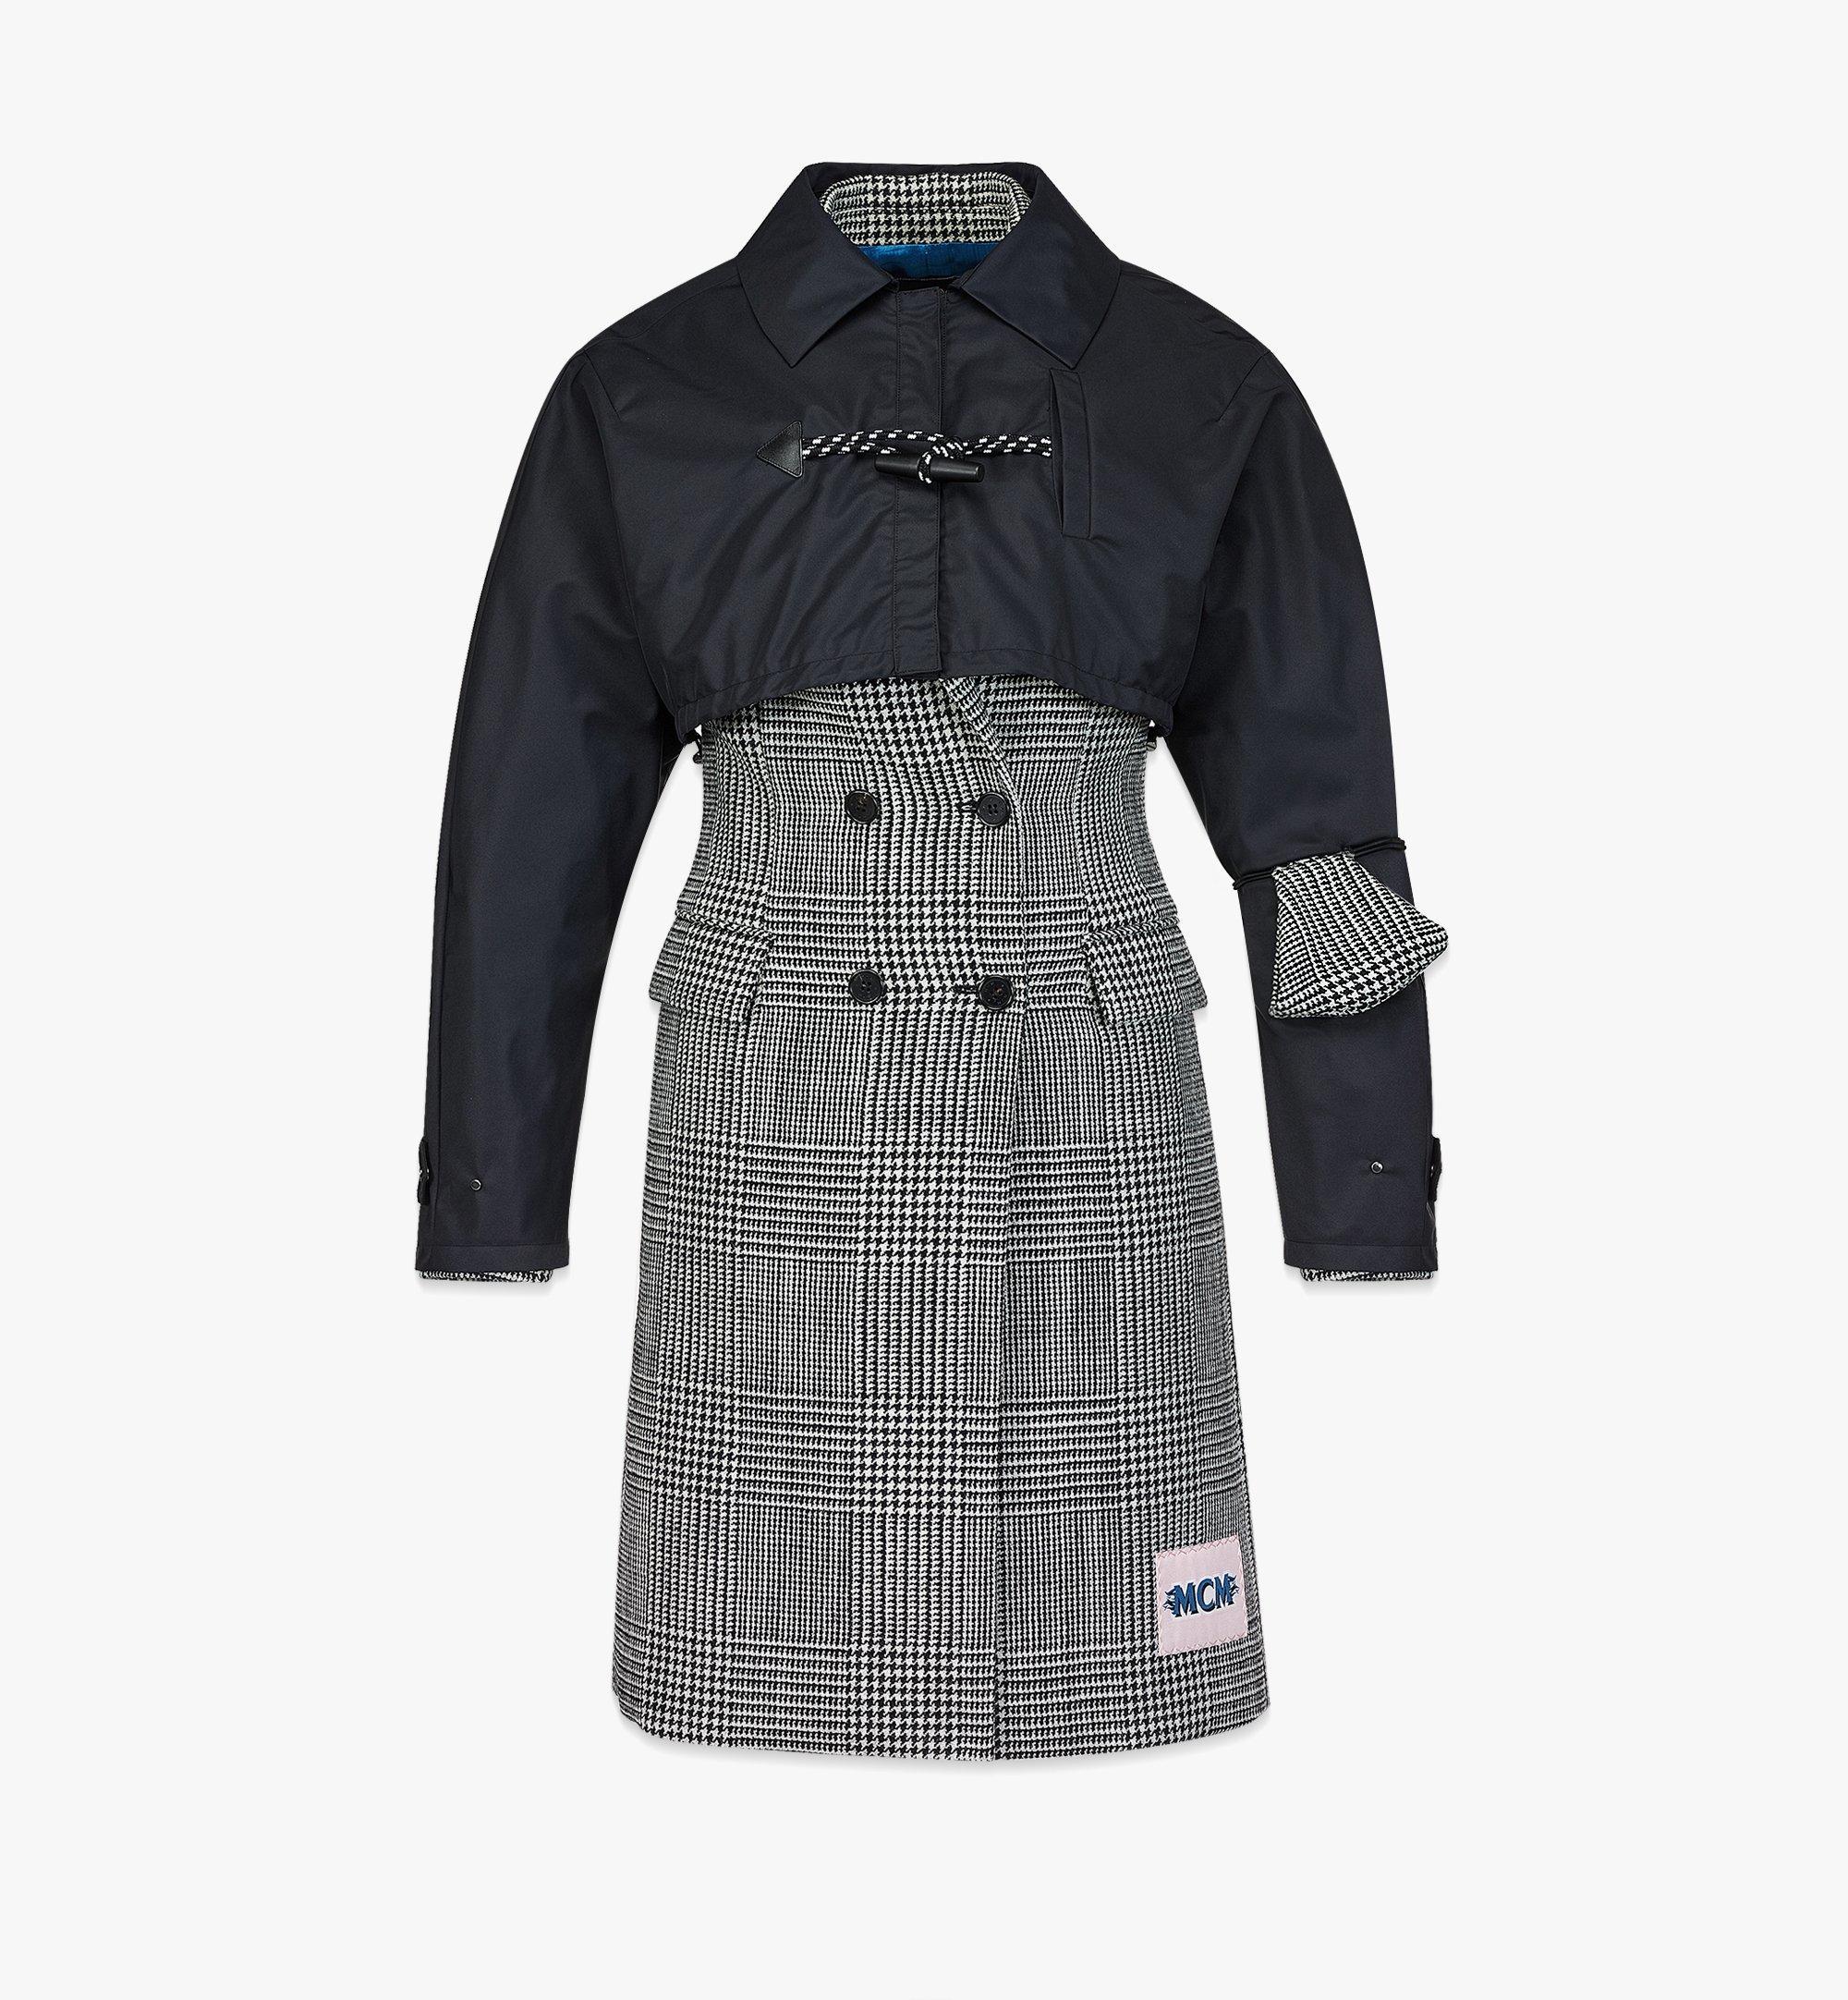 MCM Women's Check Wool Coat with Nylon Overlay Black MFCBAMM01BK038 Alternate View 1